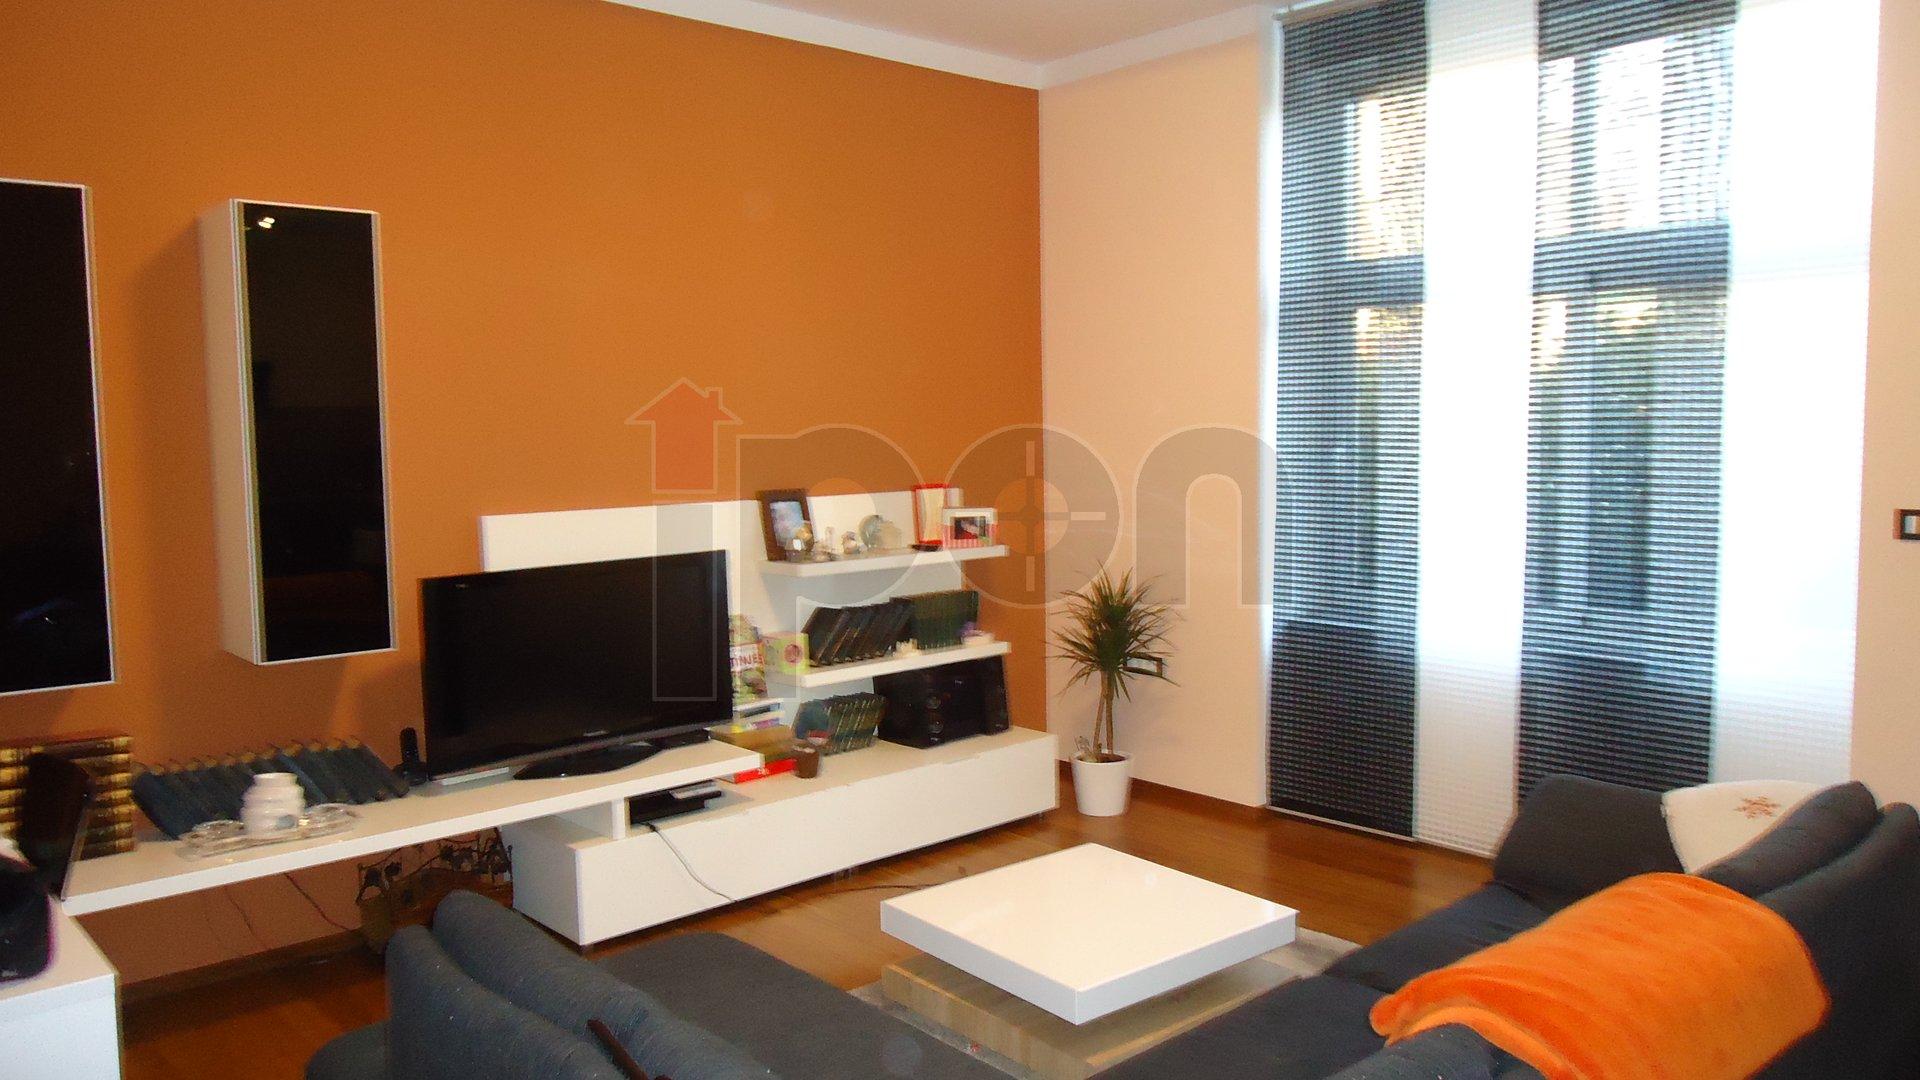 Appartamento, 88 m2, Vendita, Rijeka - Trsat